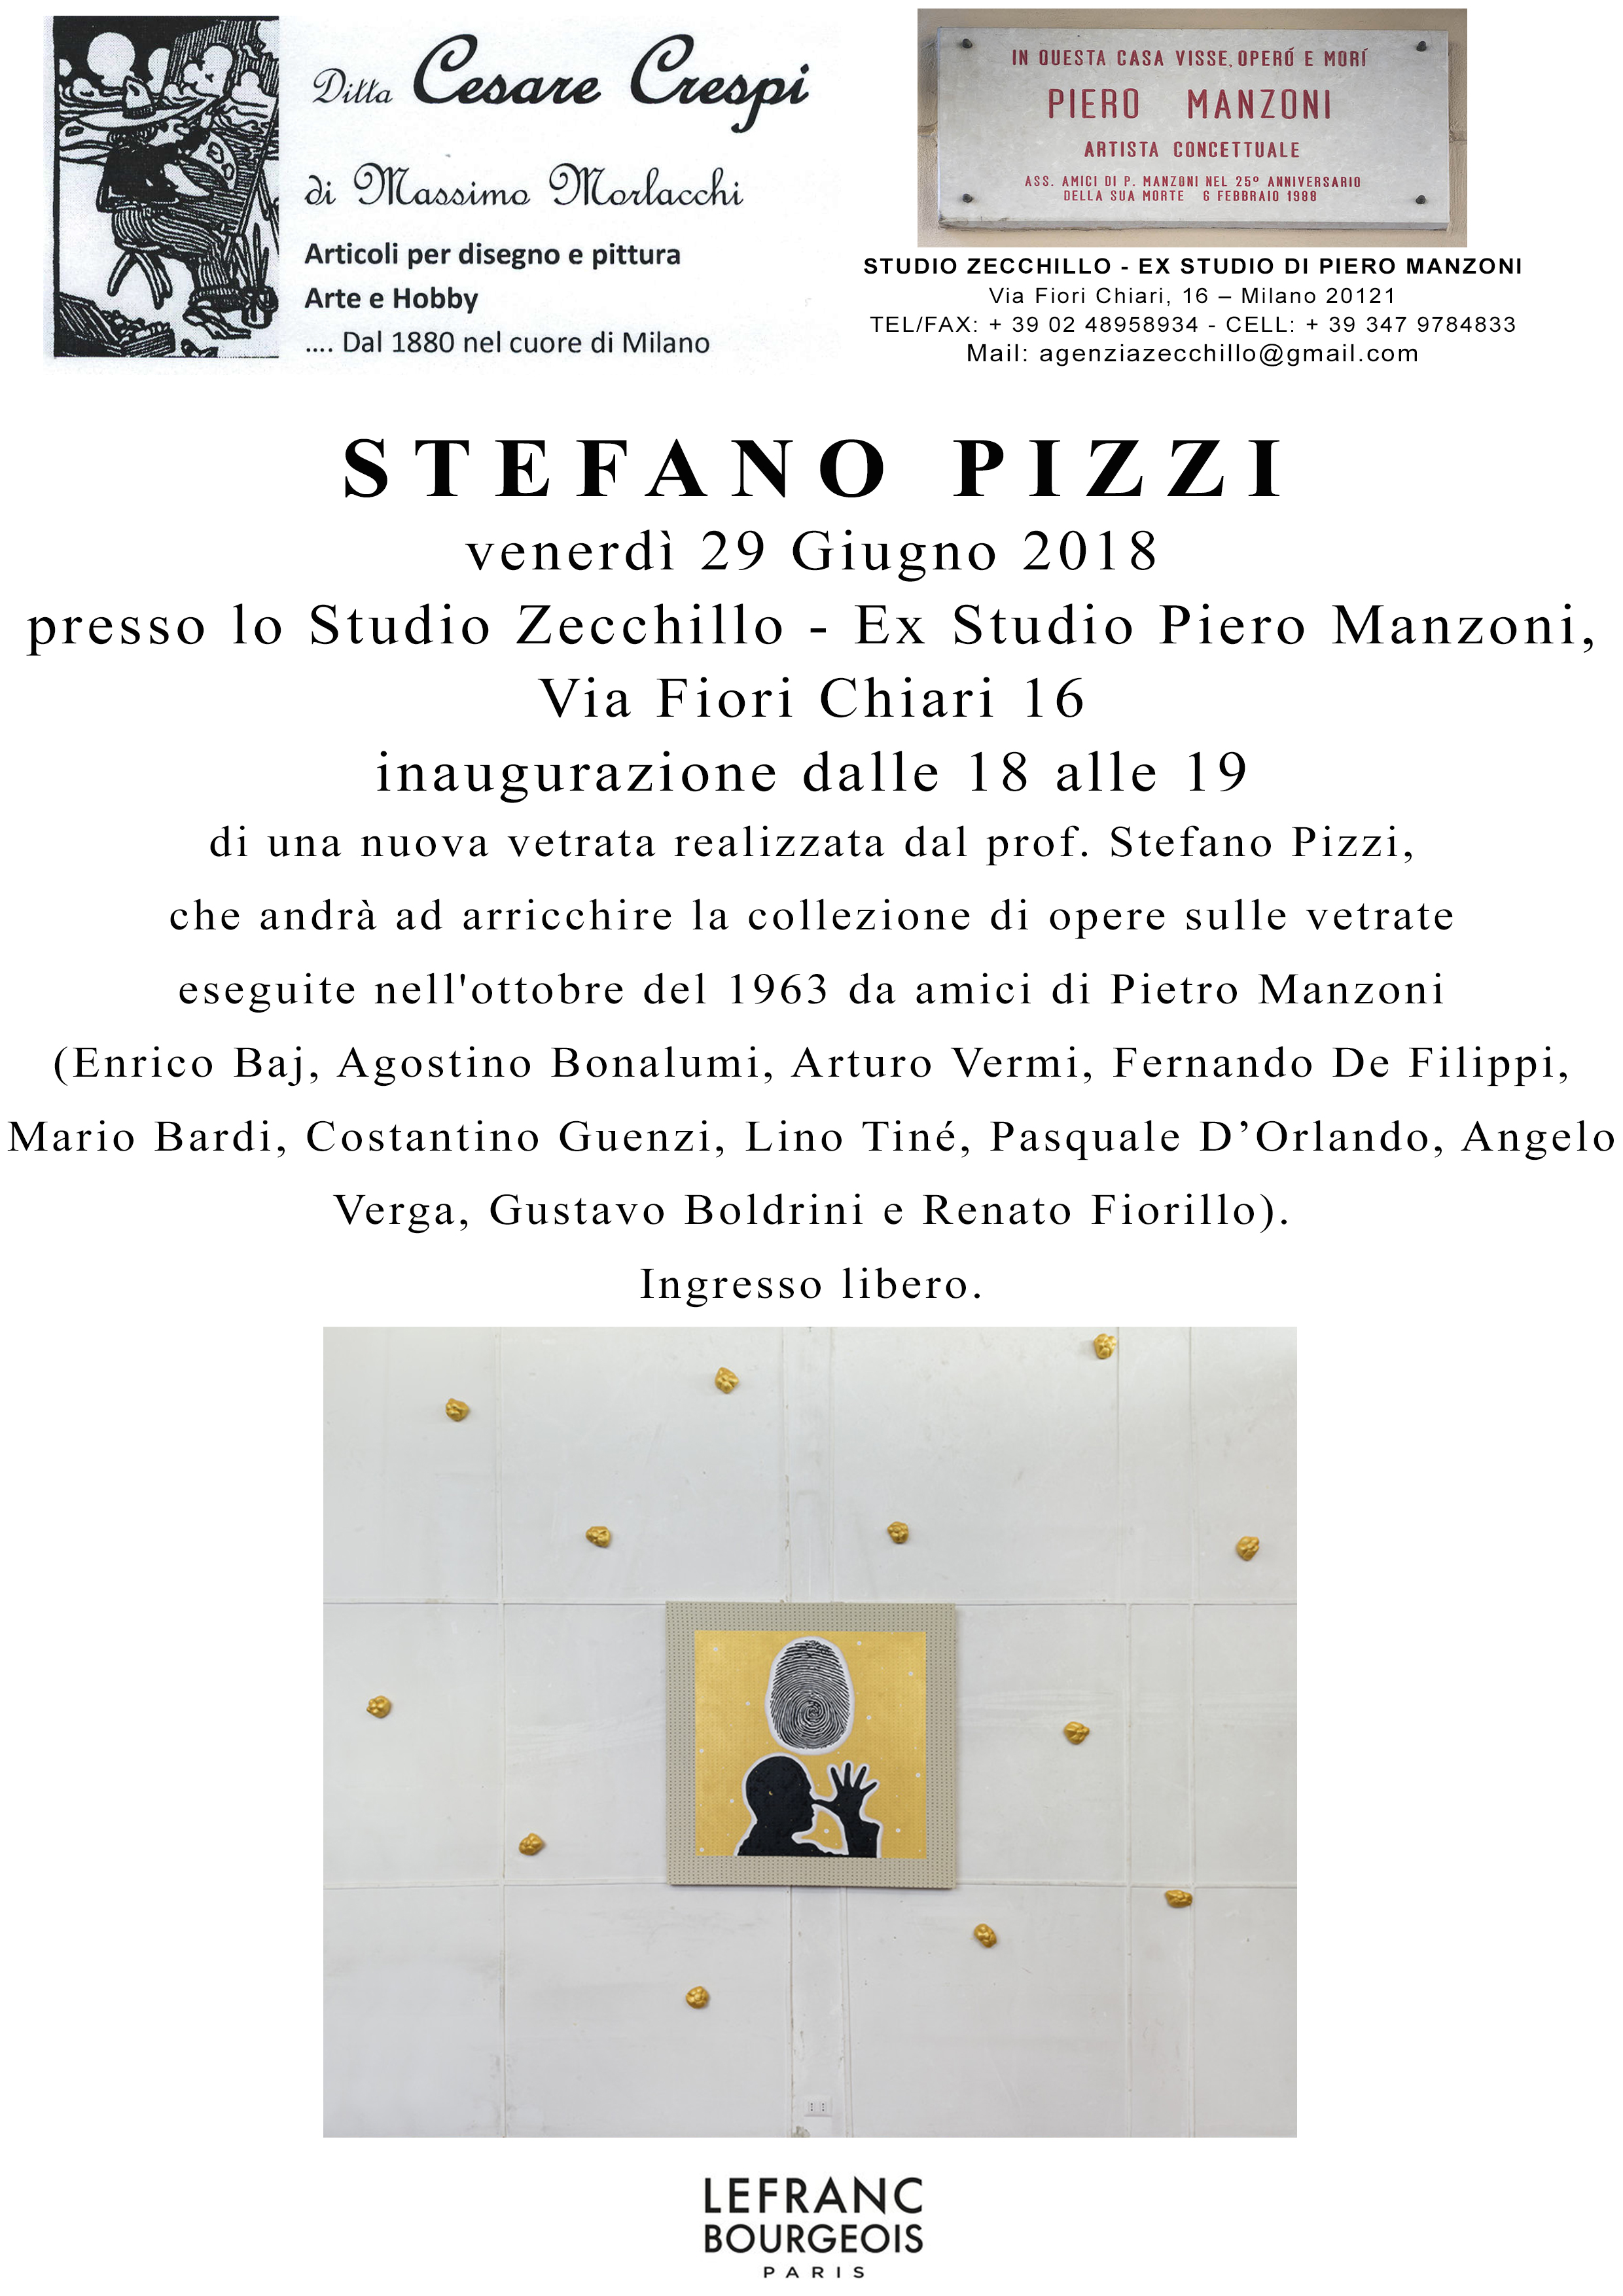 STUDIO ZECCHILLO LOCANDINA copia